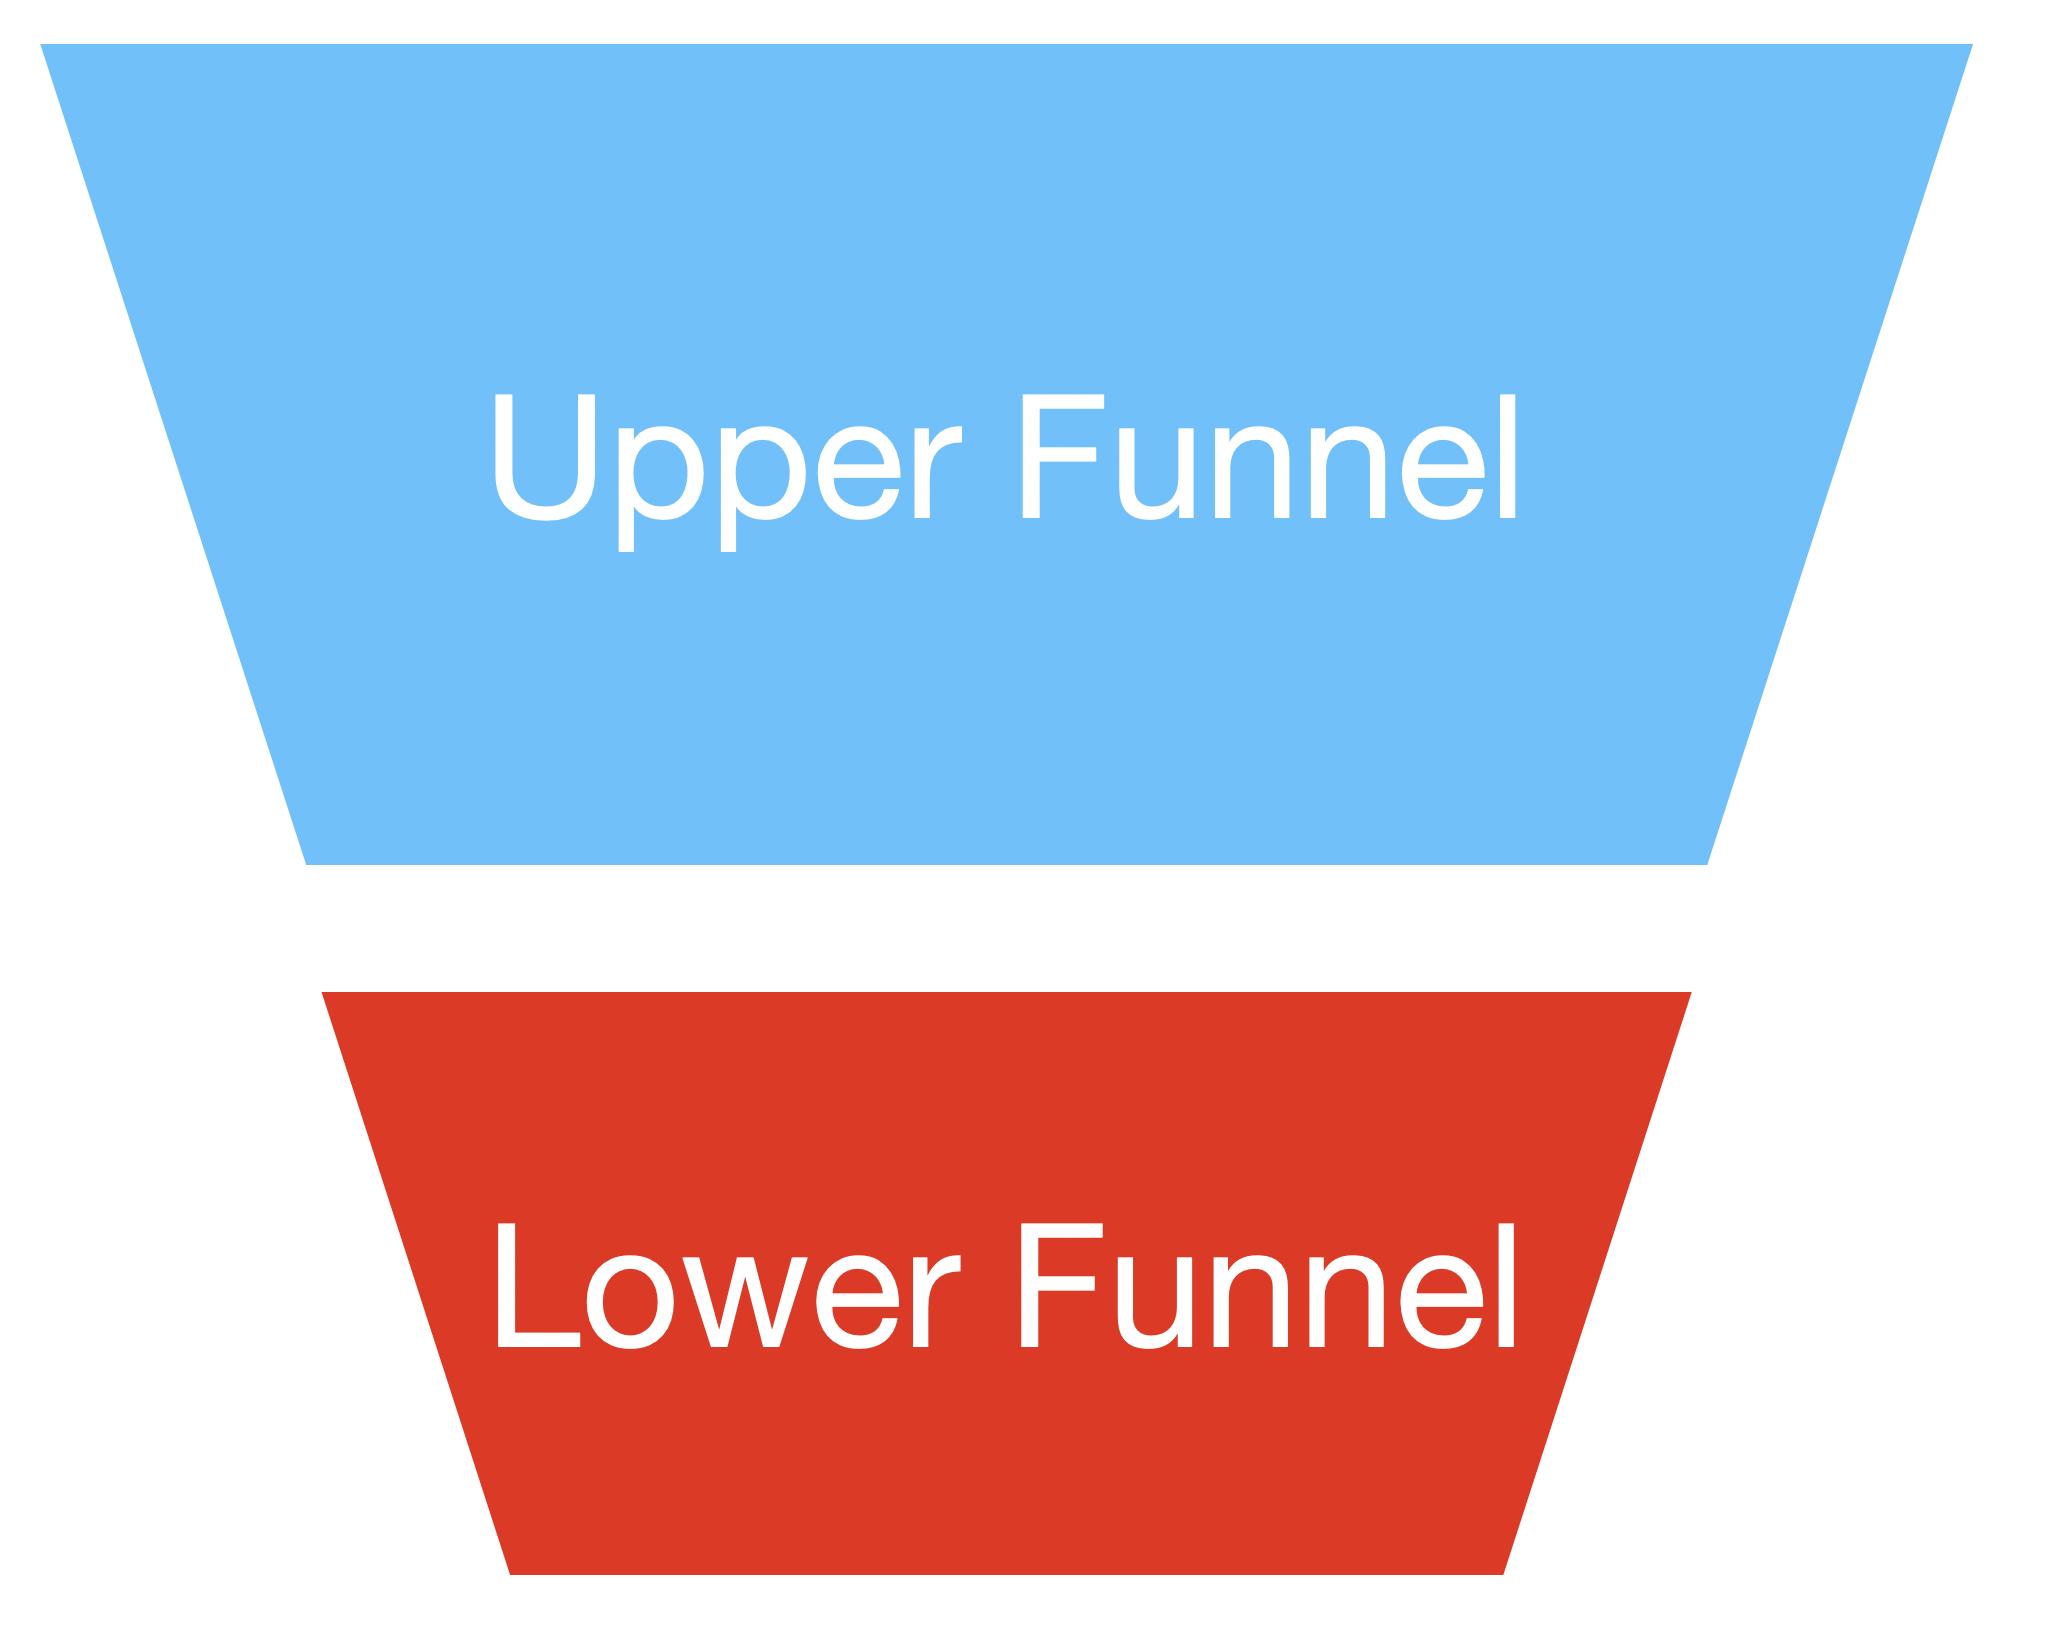 Upper Funnel - Lower Funnel